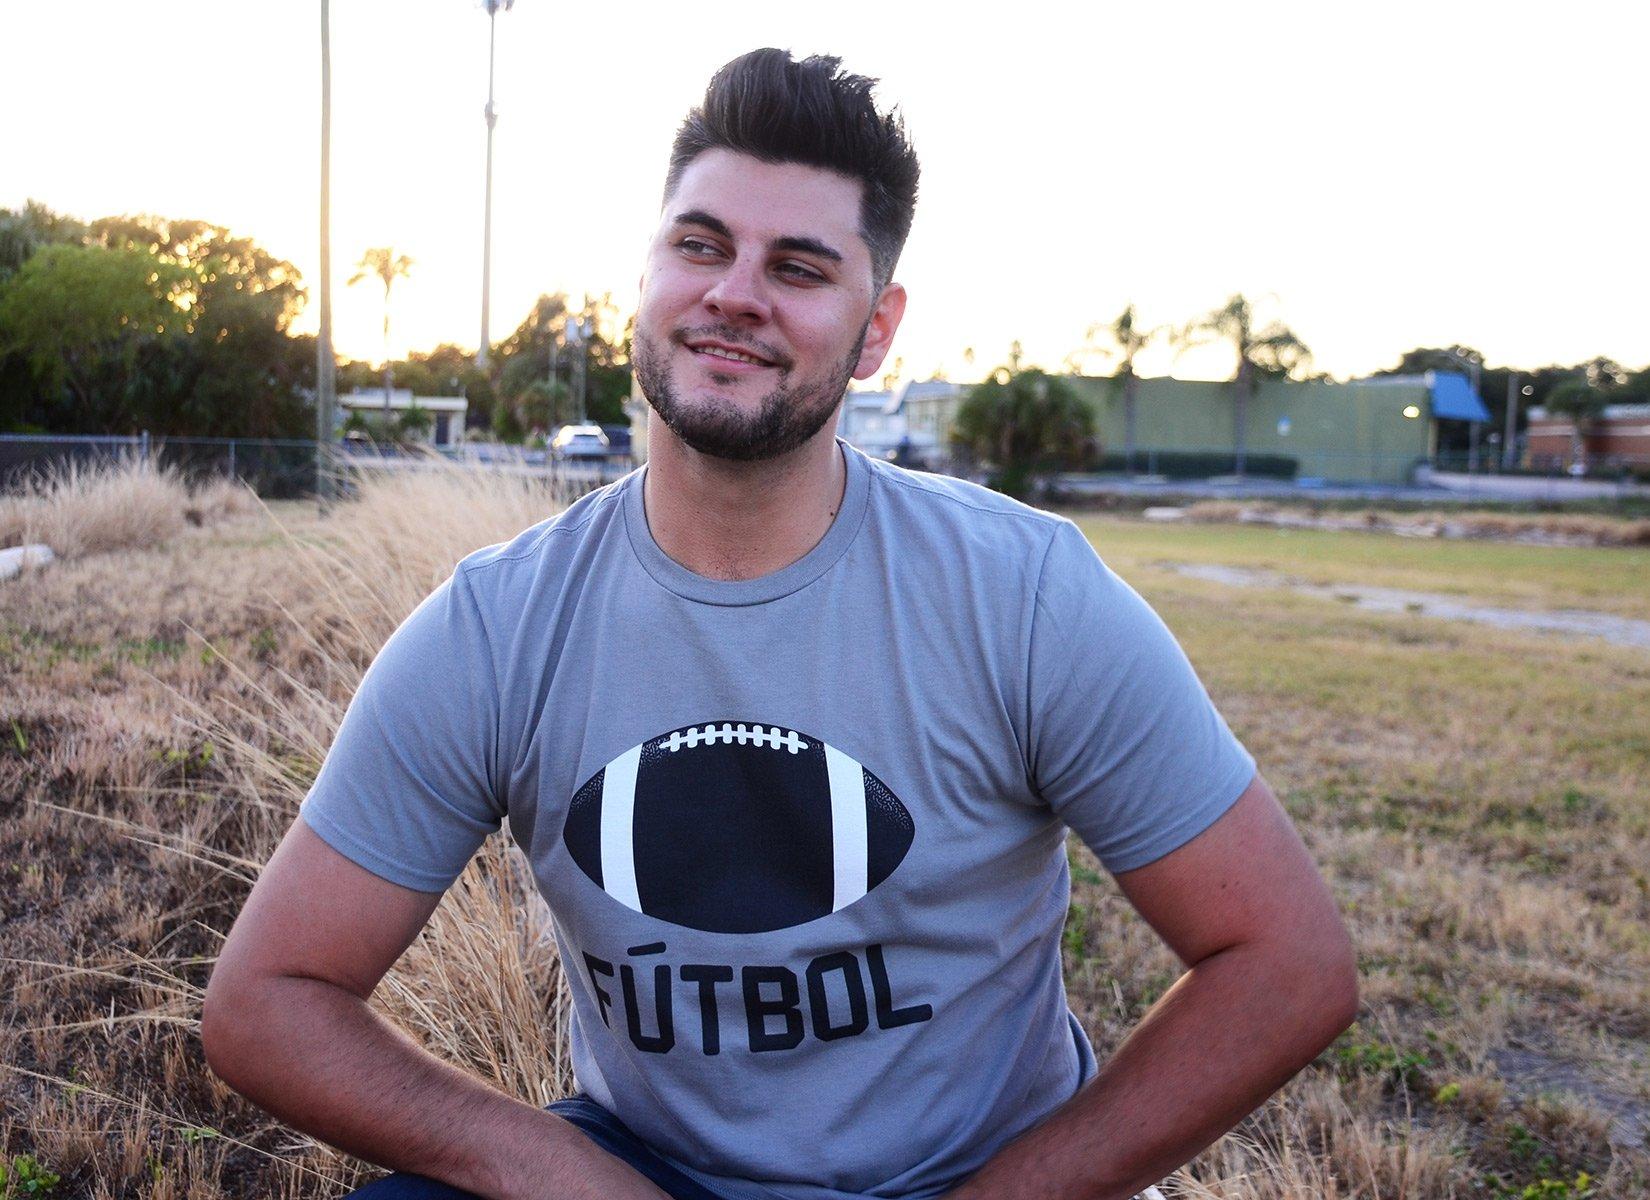 Futbol on Mens T-Shirt